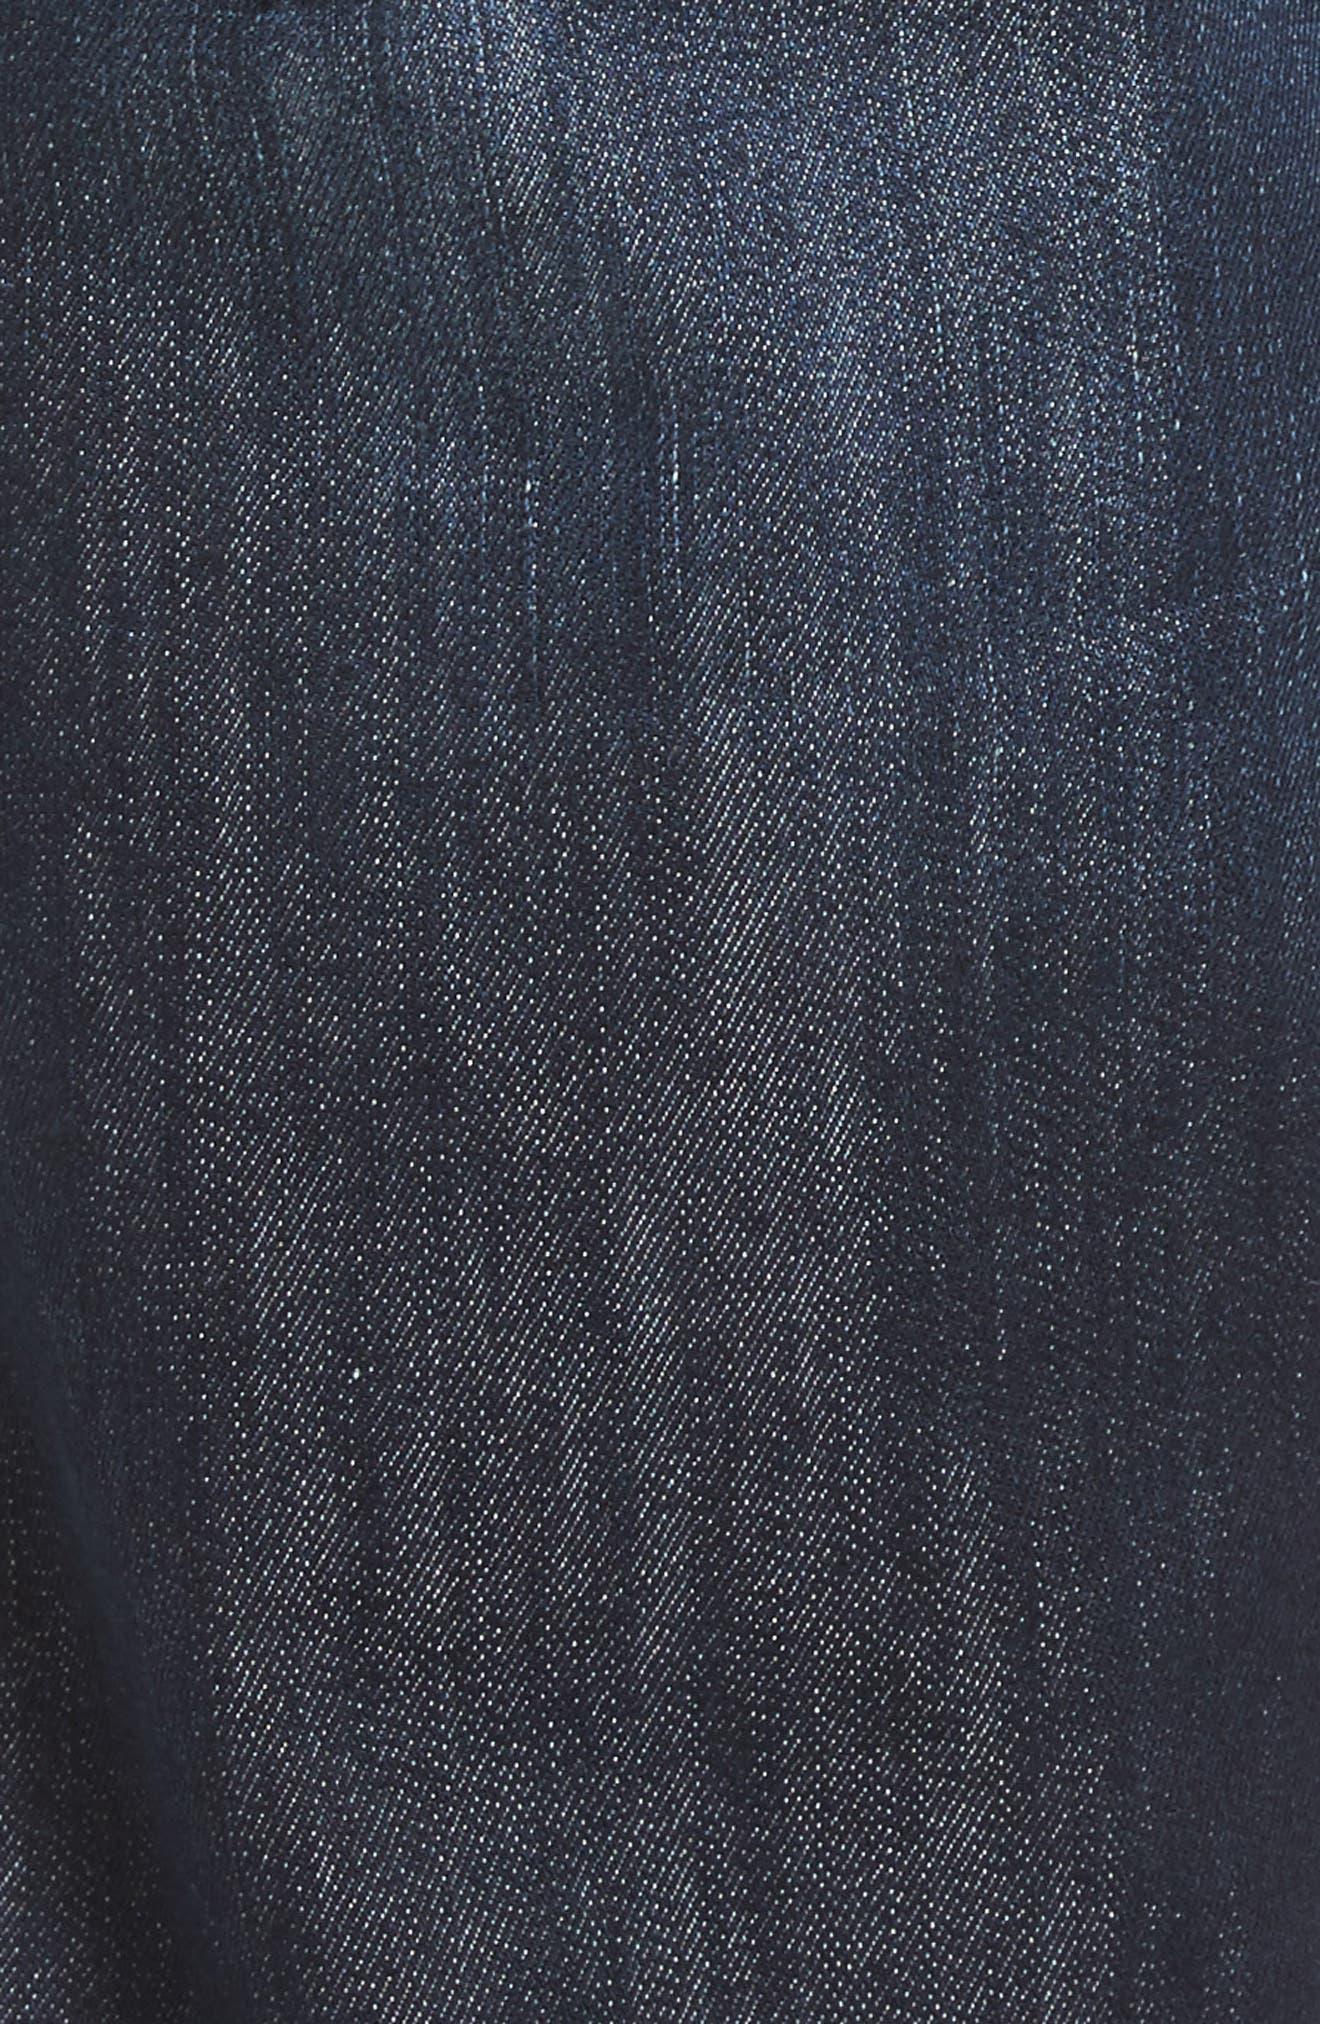 Matt Relaxed Fit Jeans,                             Alternate thumbnail 5, color,                             DARK STANFORD